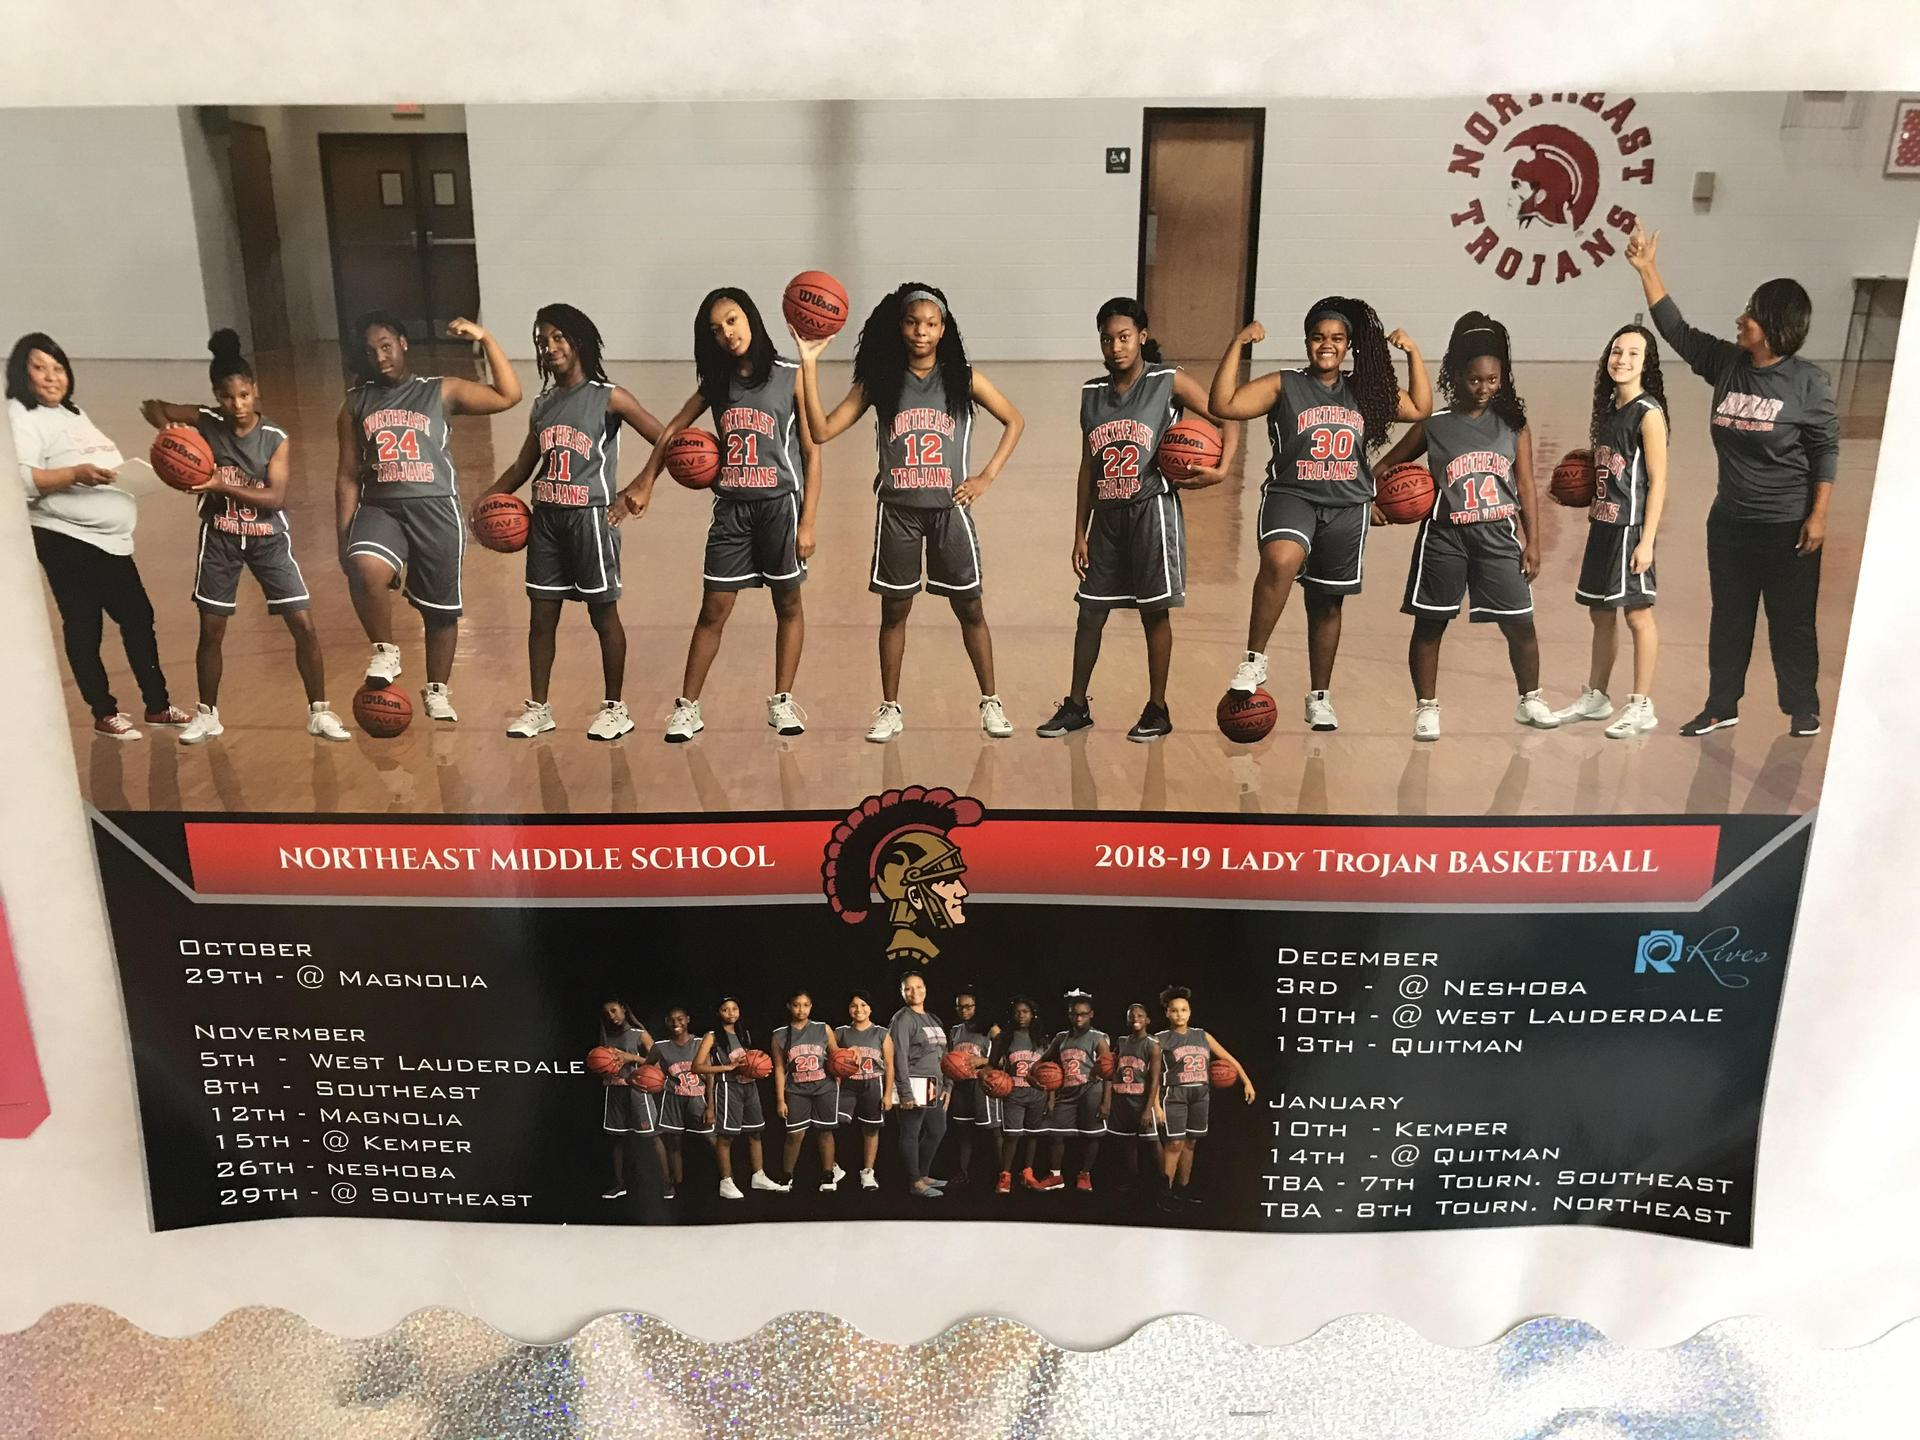 Northeast Middle School Lady Trojan basketball team members